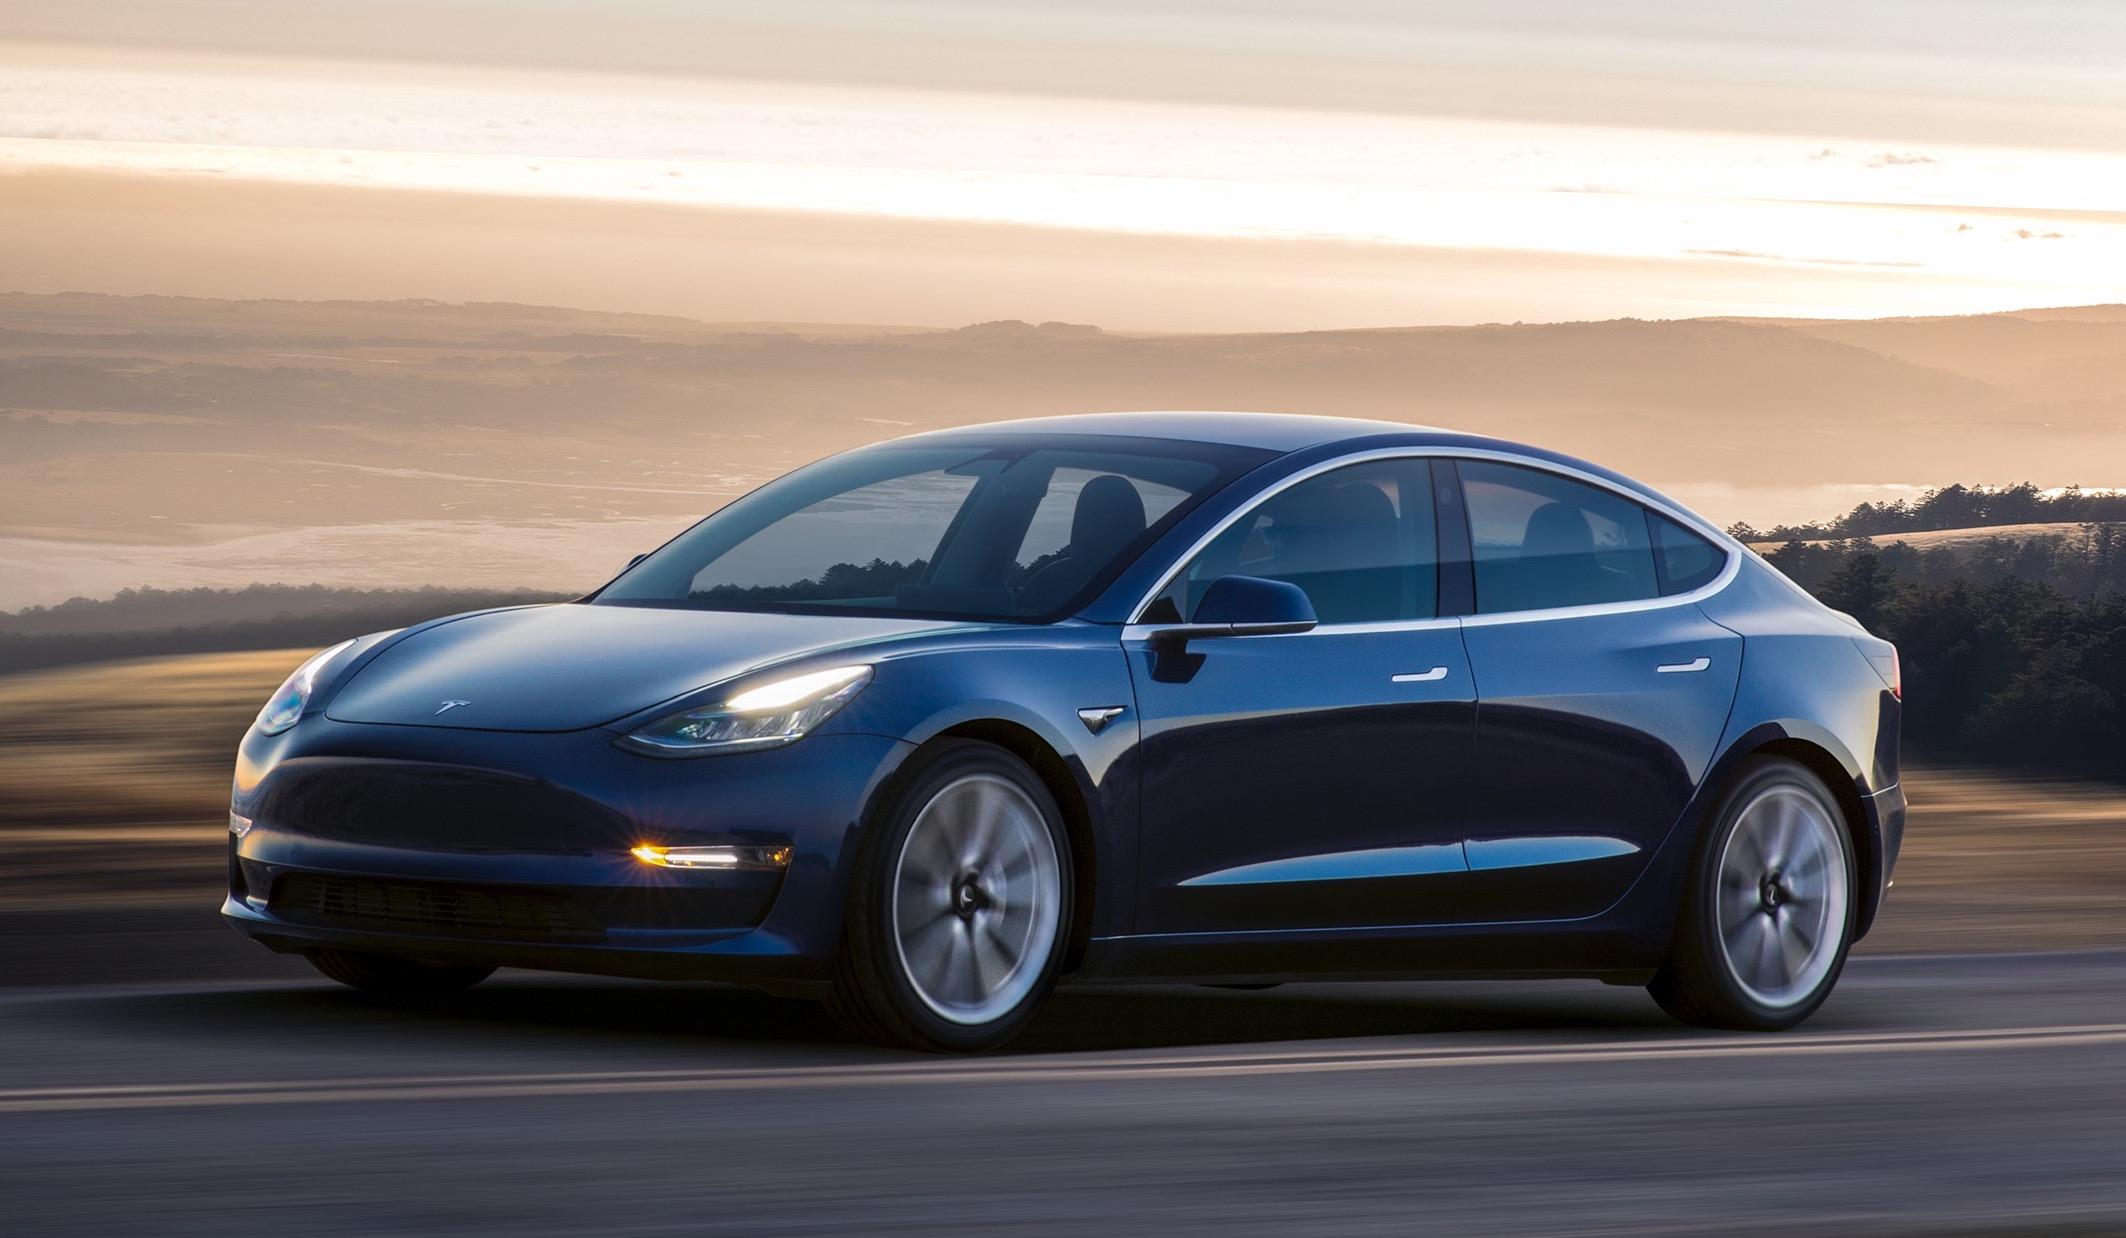 A dark blue Tesla Model 3, a compact luxury sports sedan.